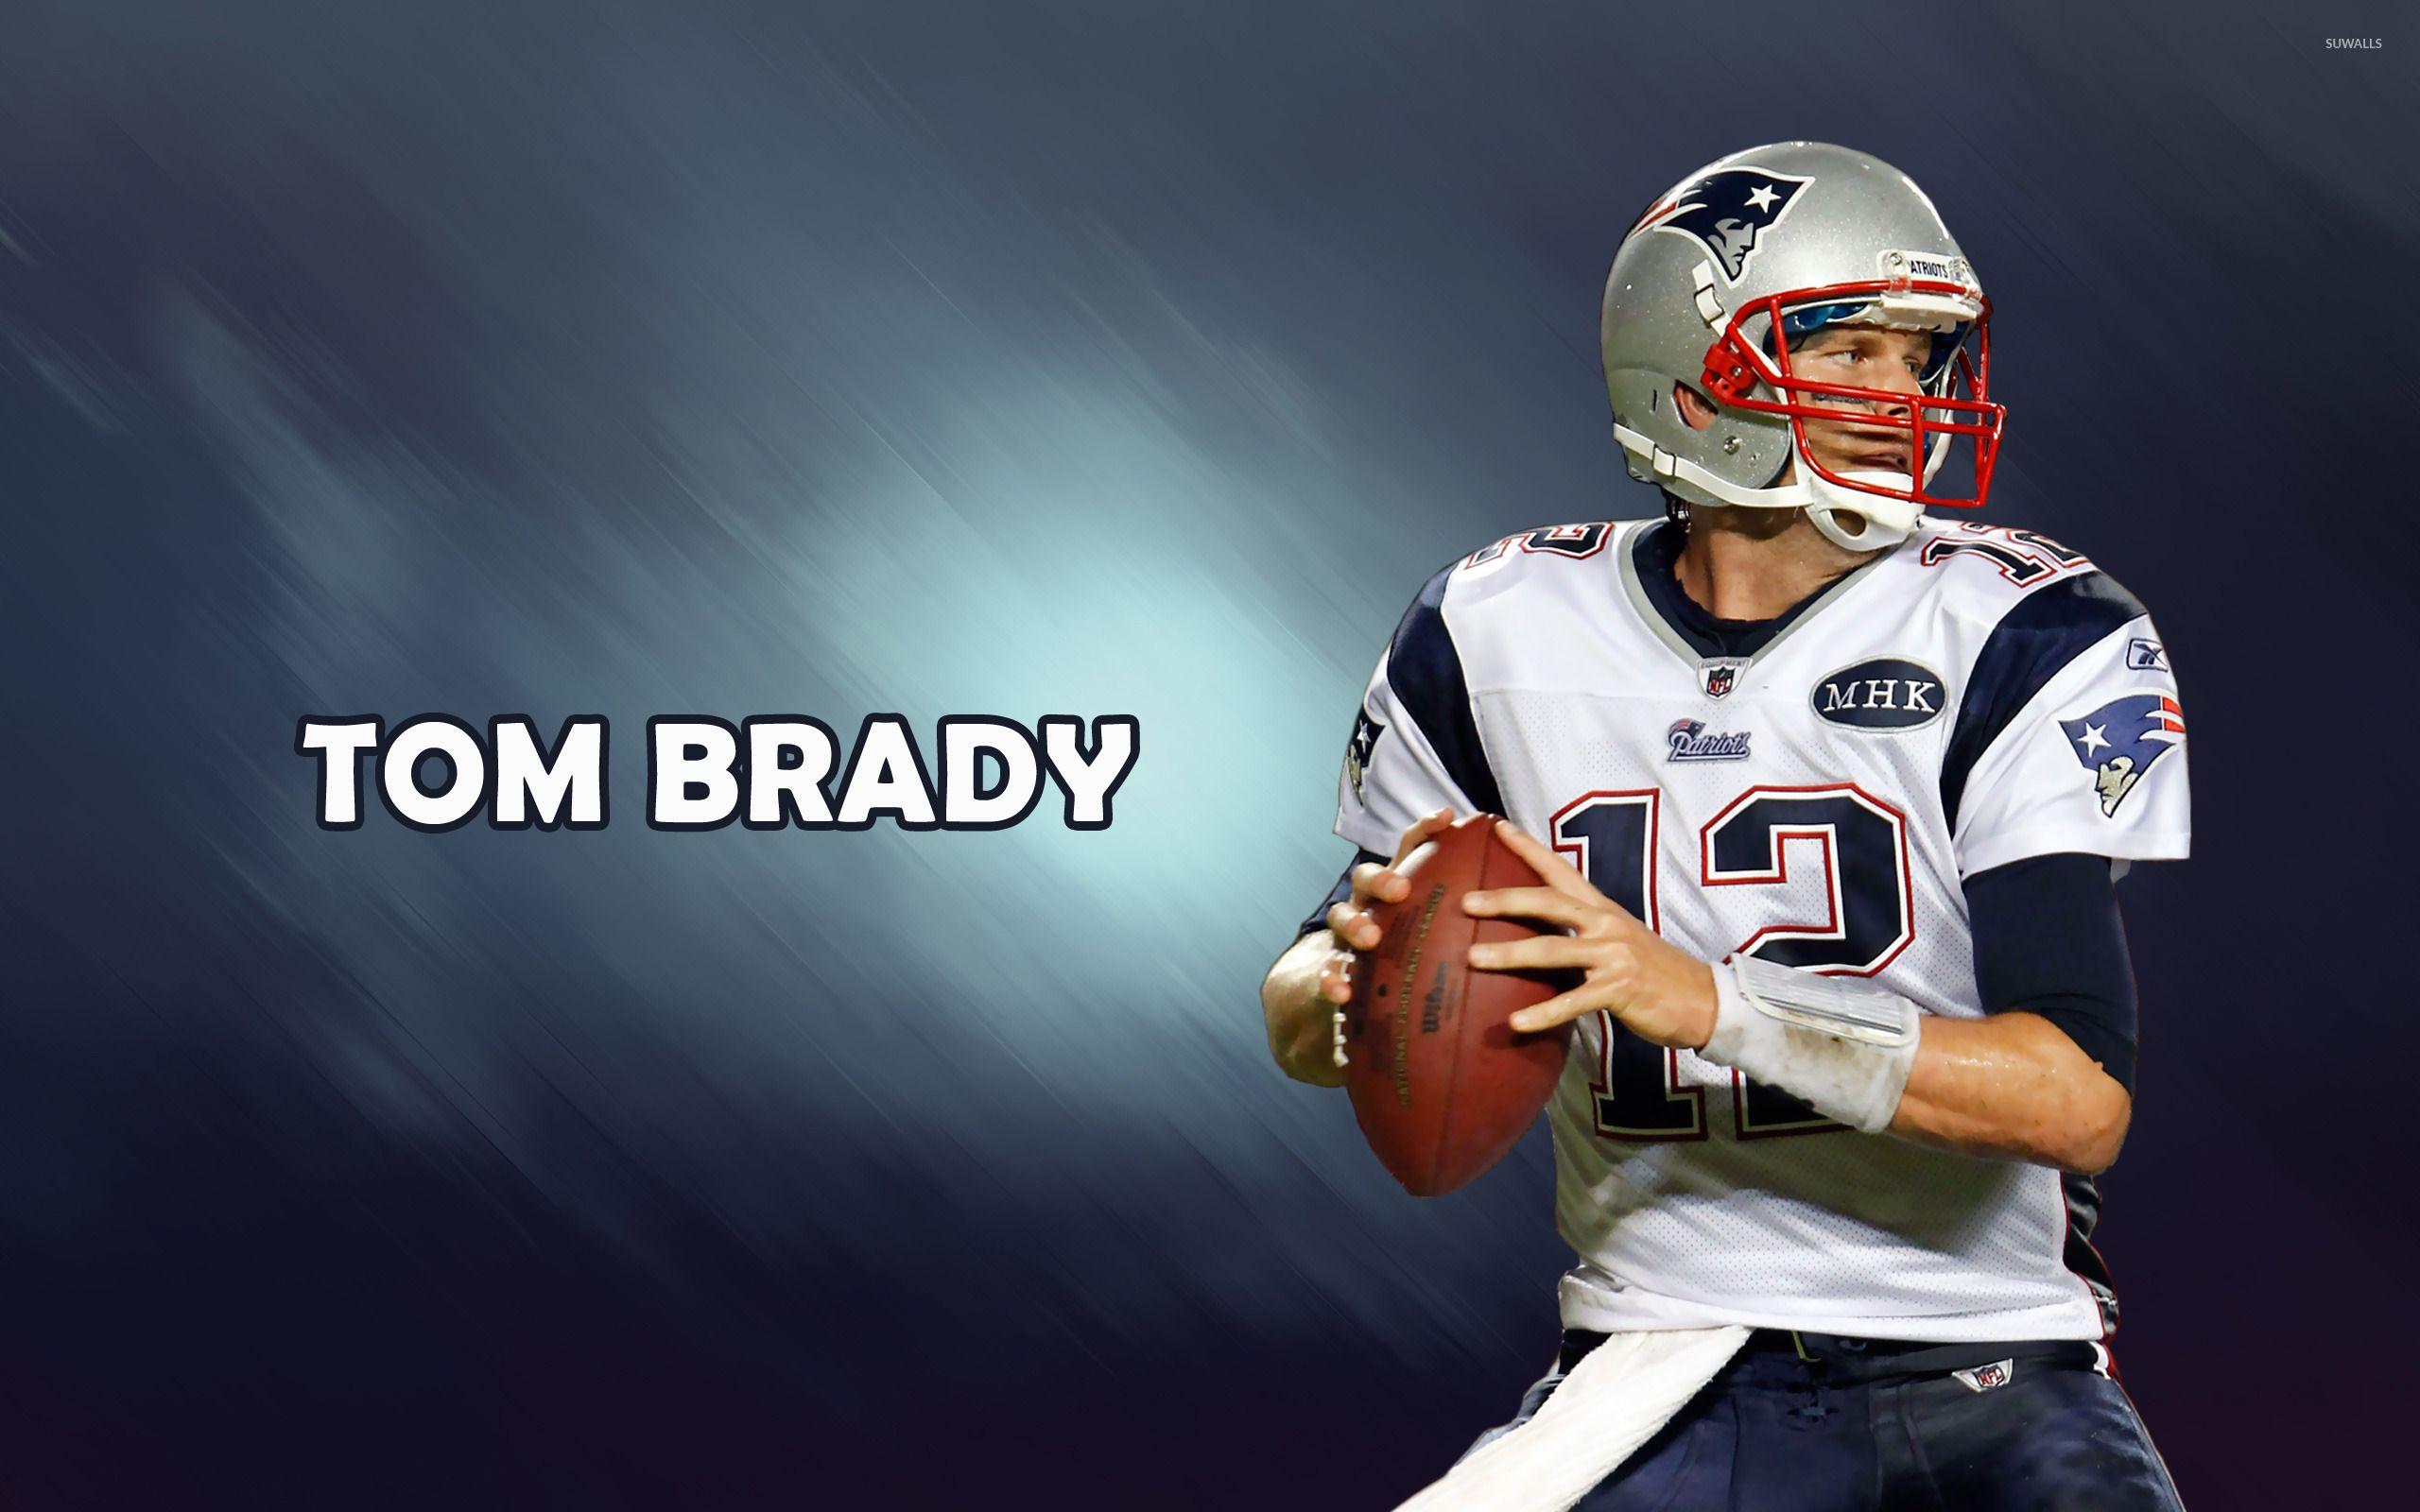 Tom Brady wallpaper Sport wallpapers 11557 All